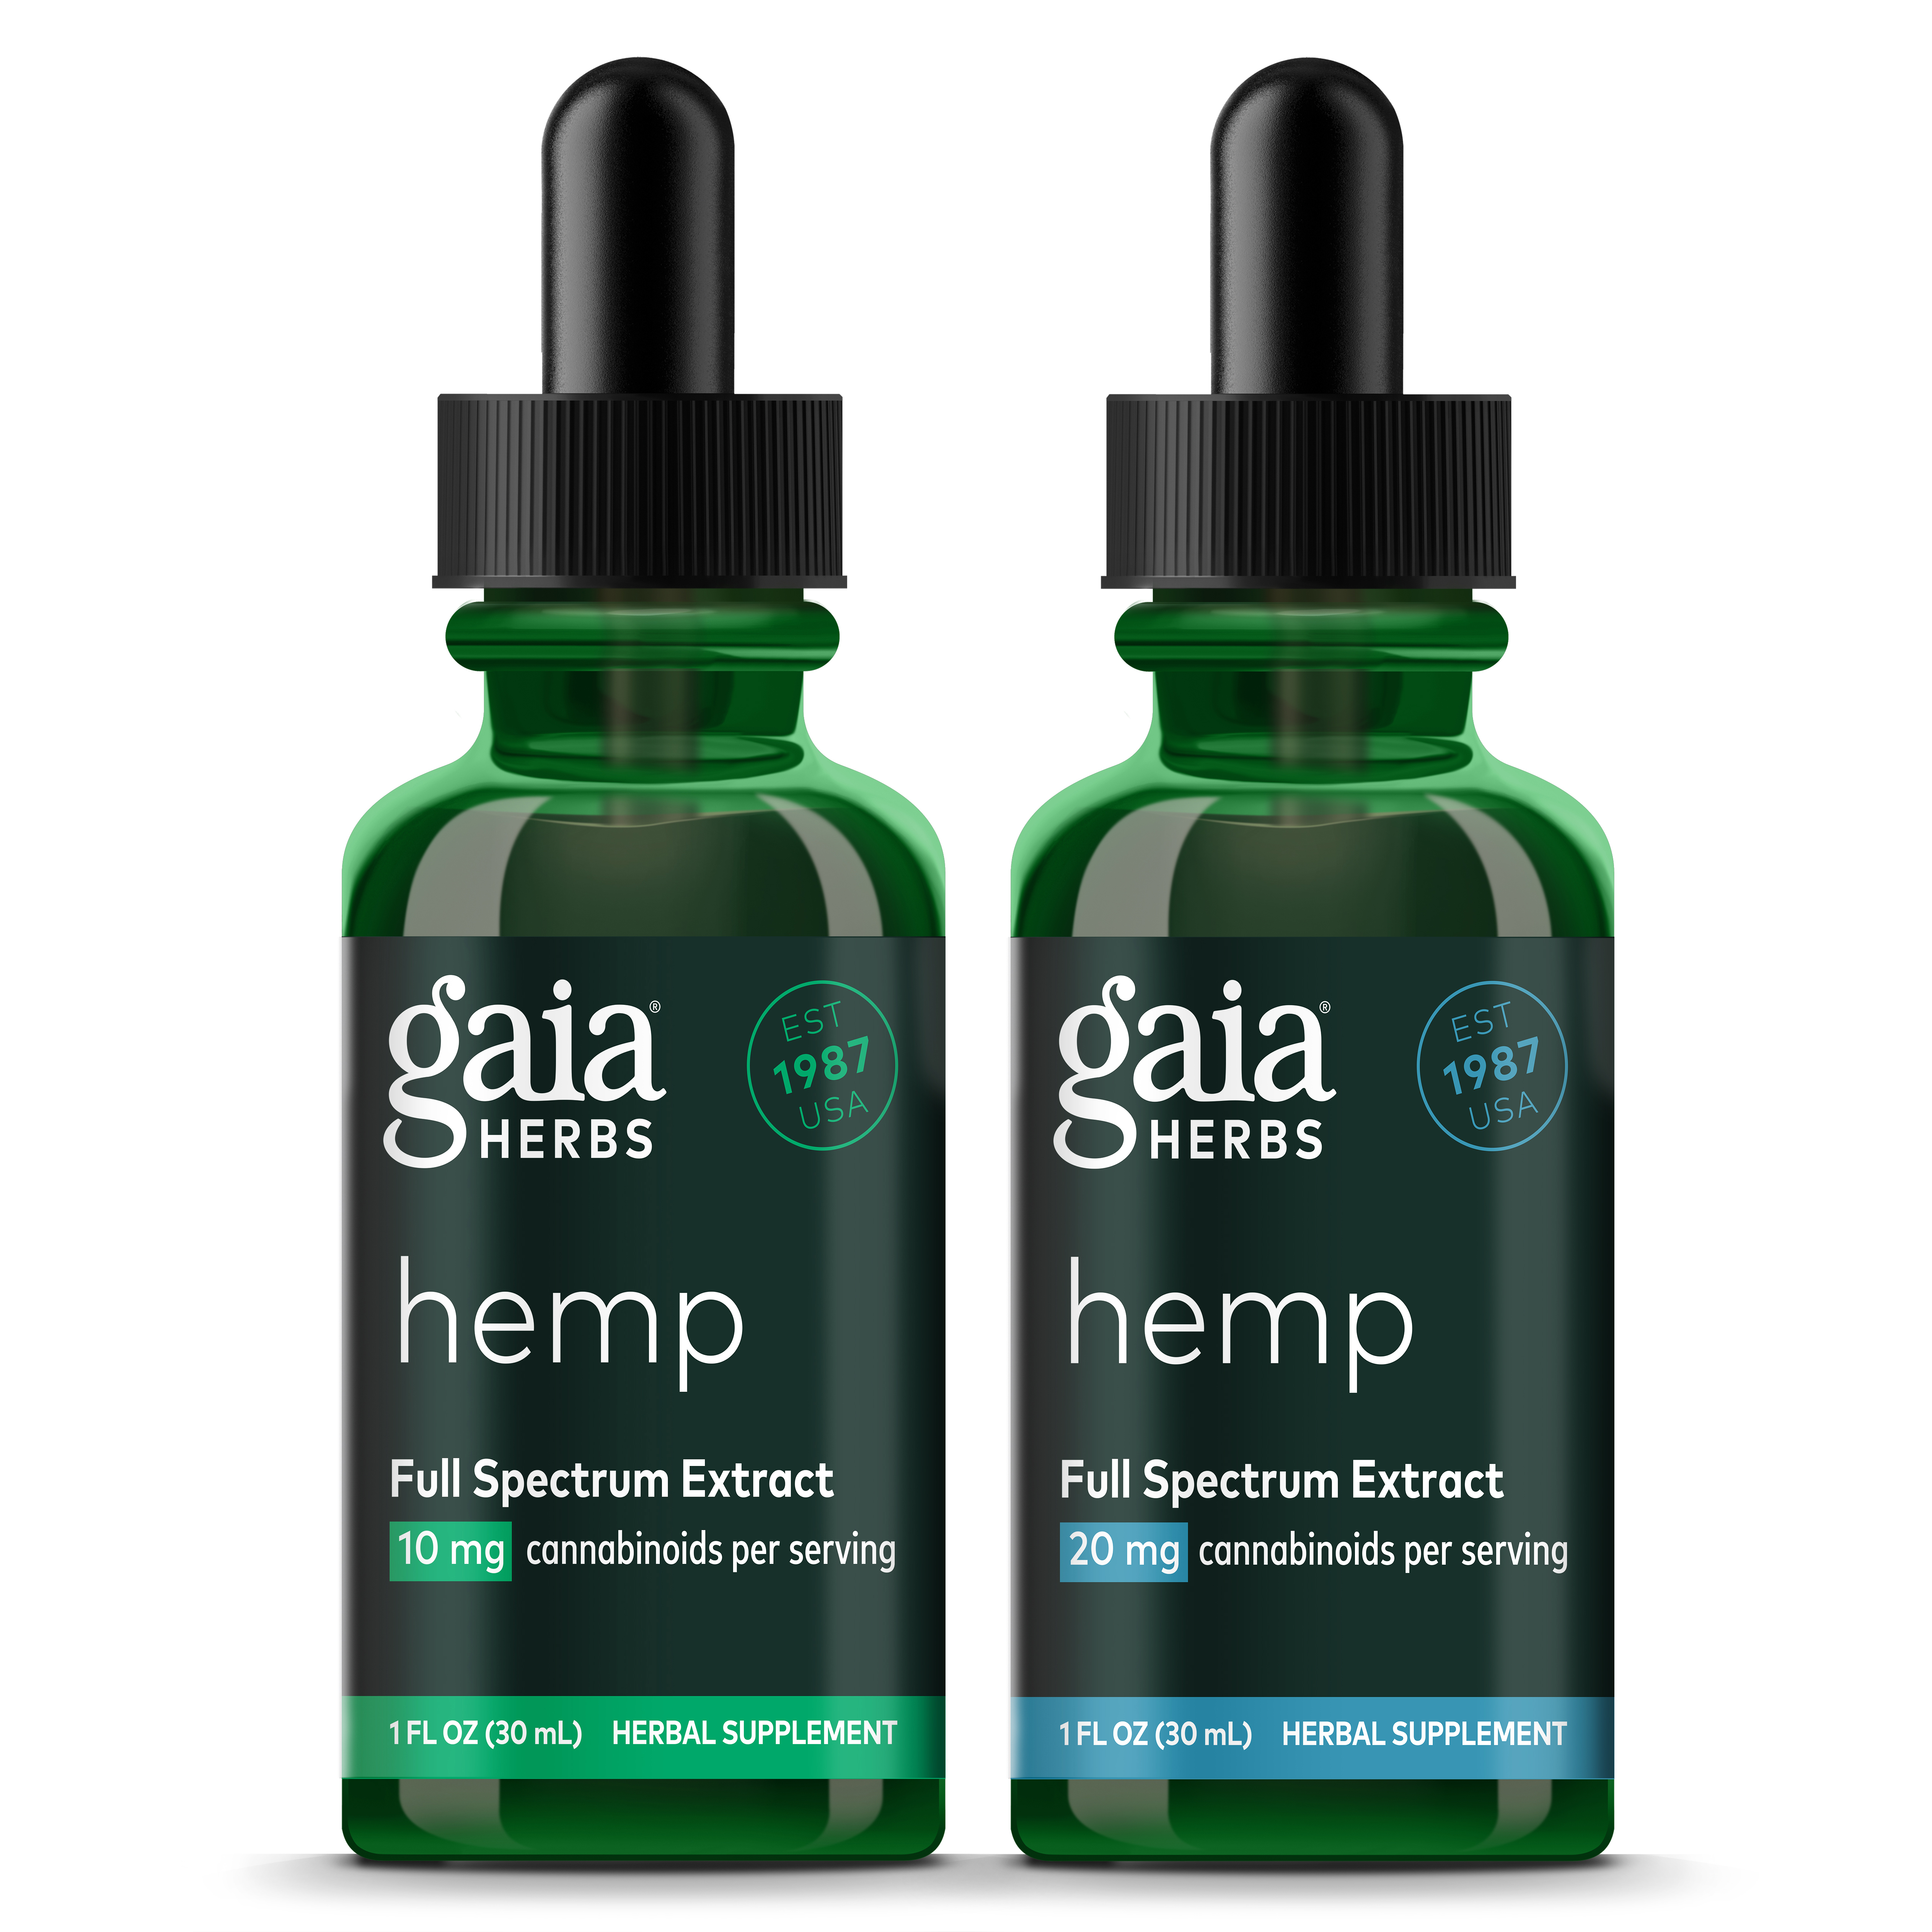 Gaia Herbs Launches Premium Full Spectrum Hemp Line | Business Wire